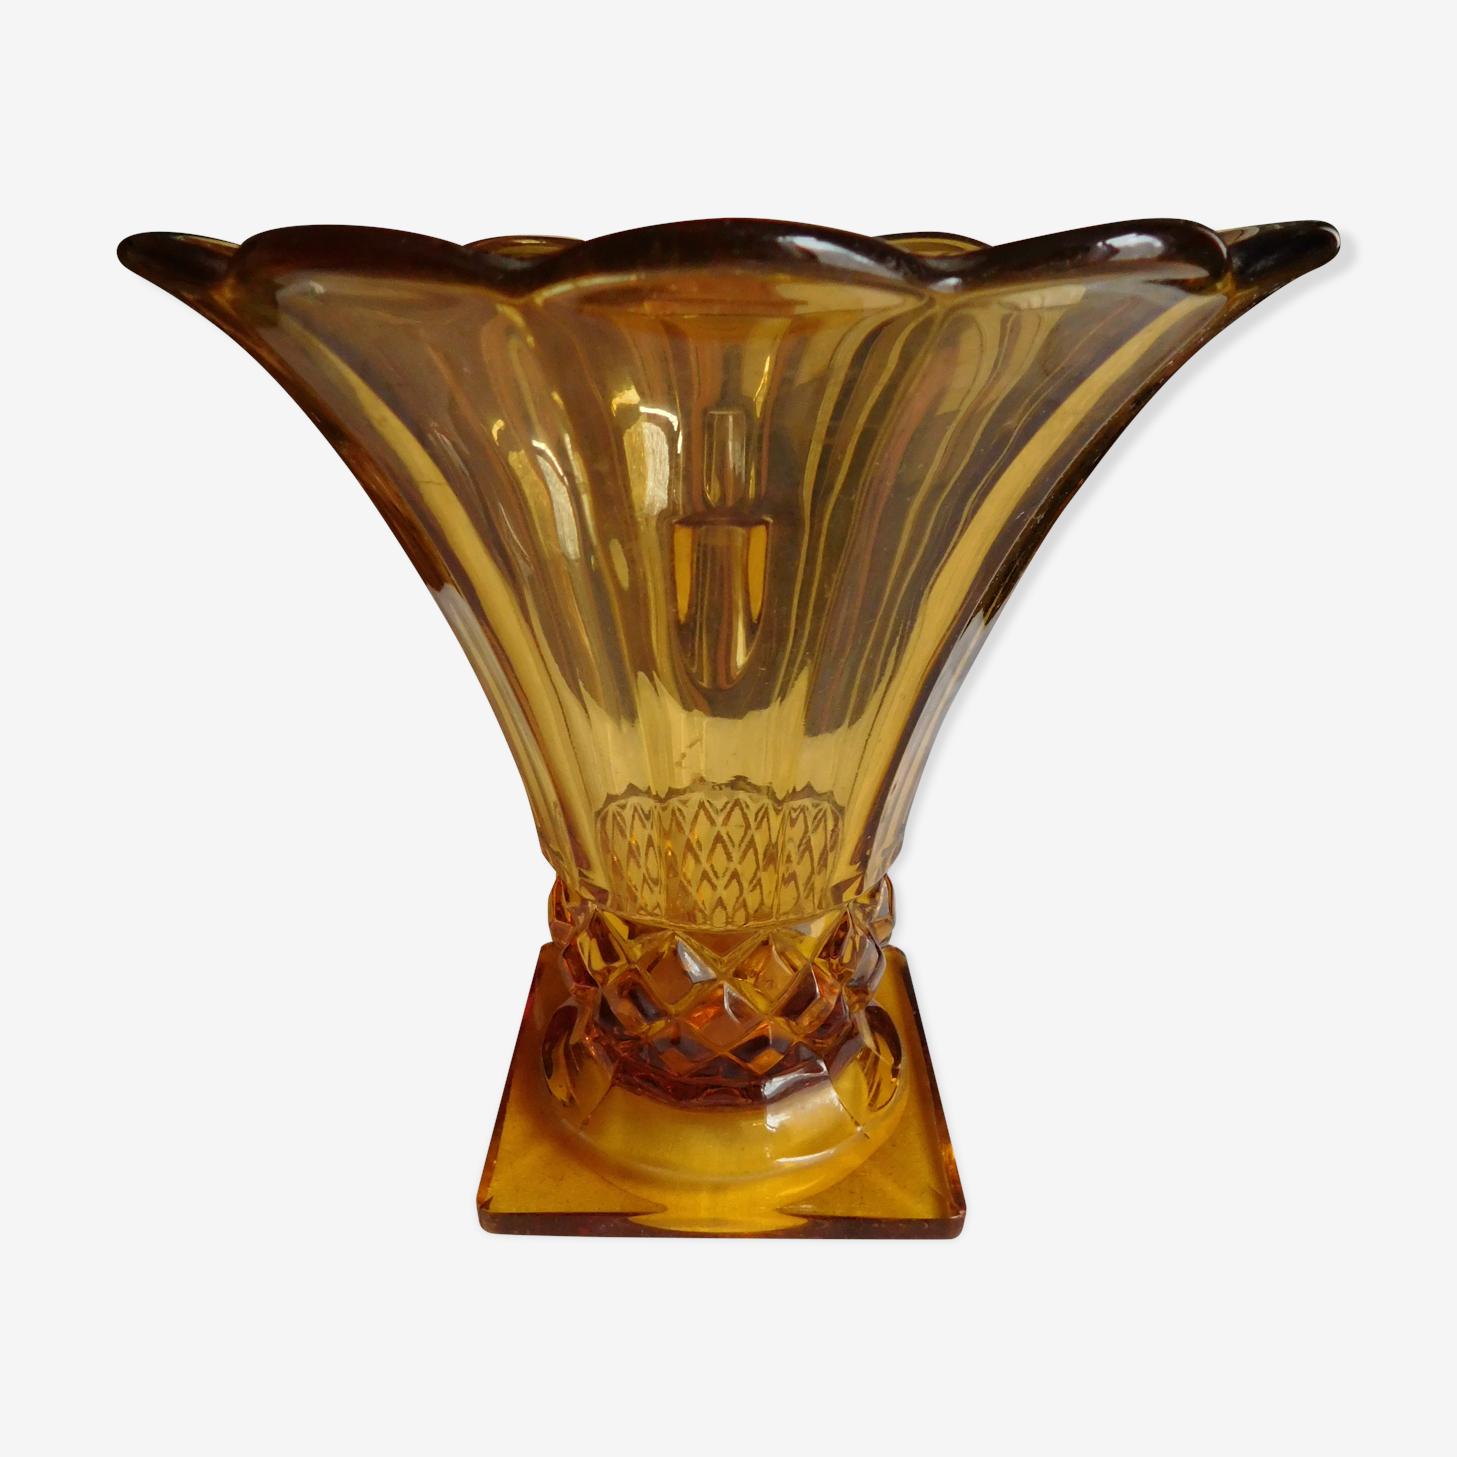 Old 50 years amber tulip vase